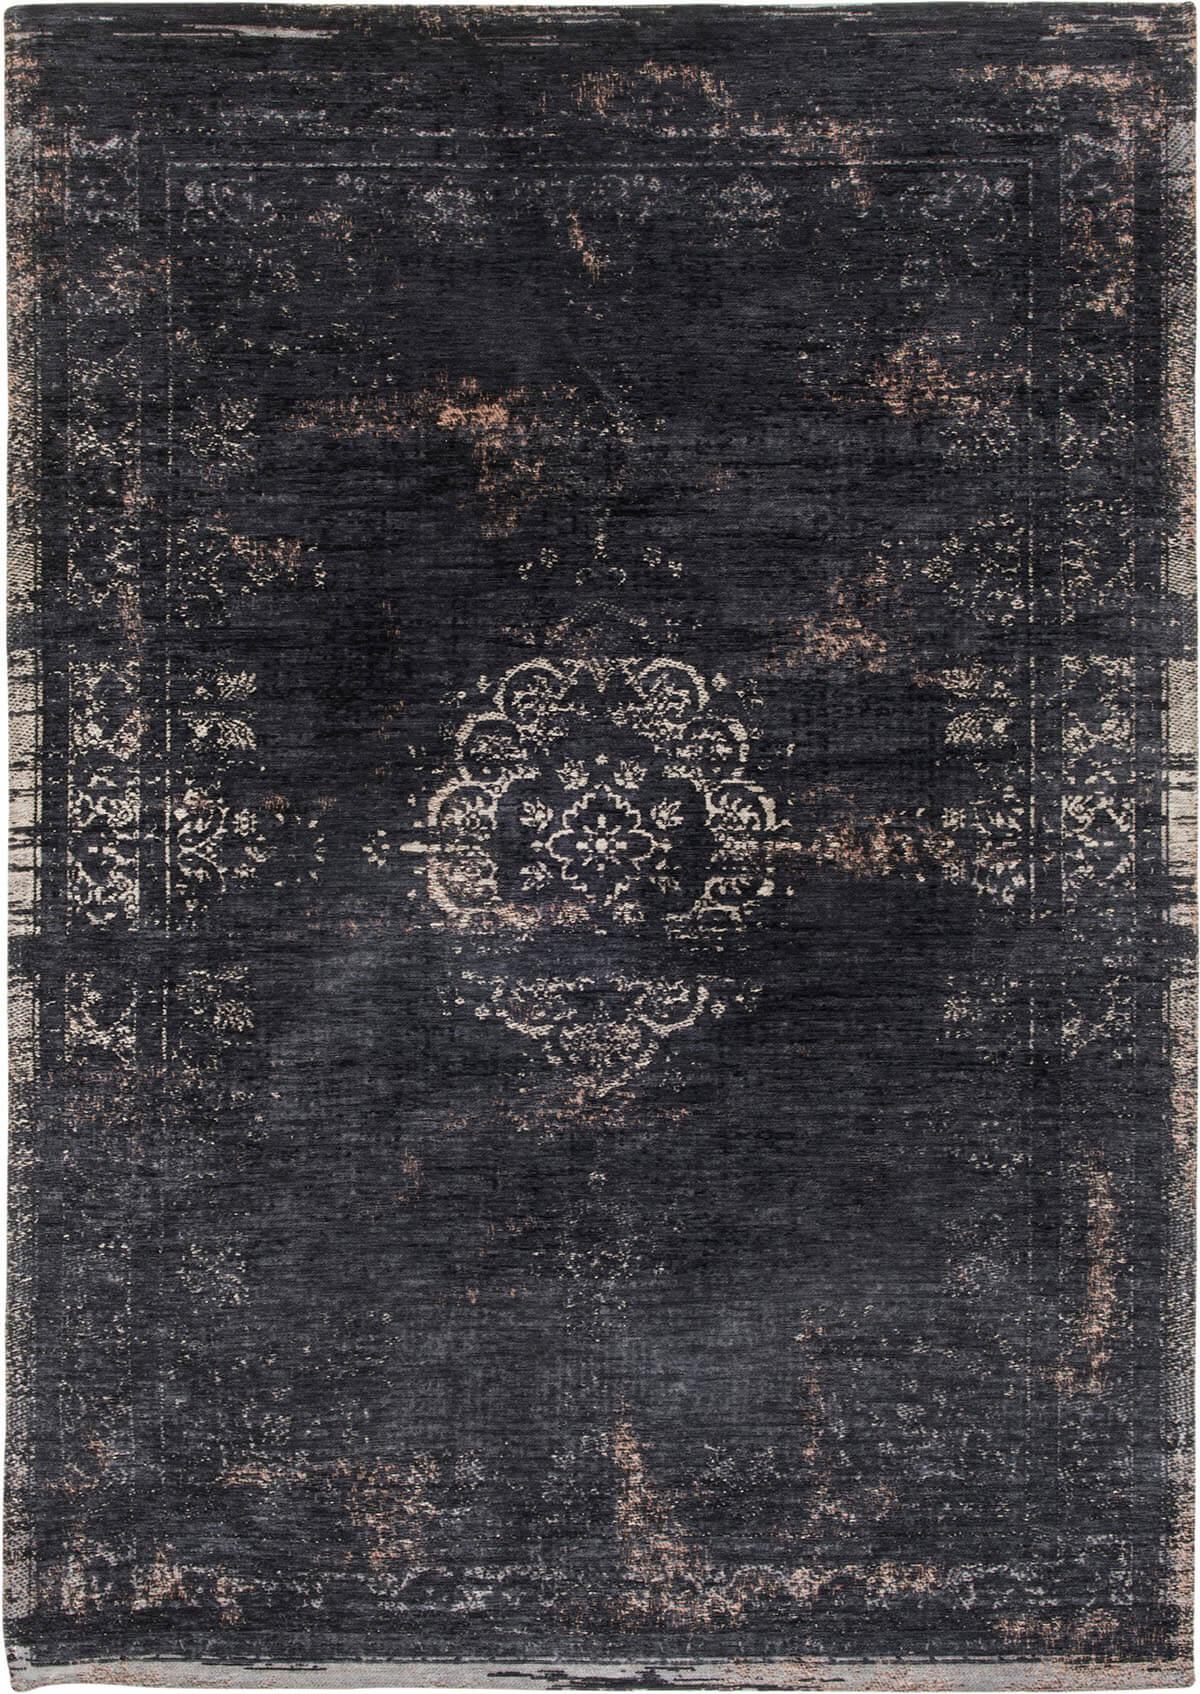 Dywan naturalny Orient czarny - Mineral Black 8263